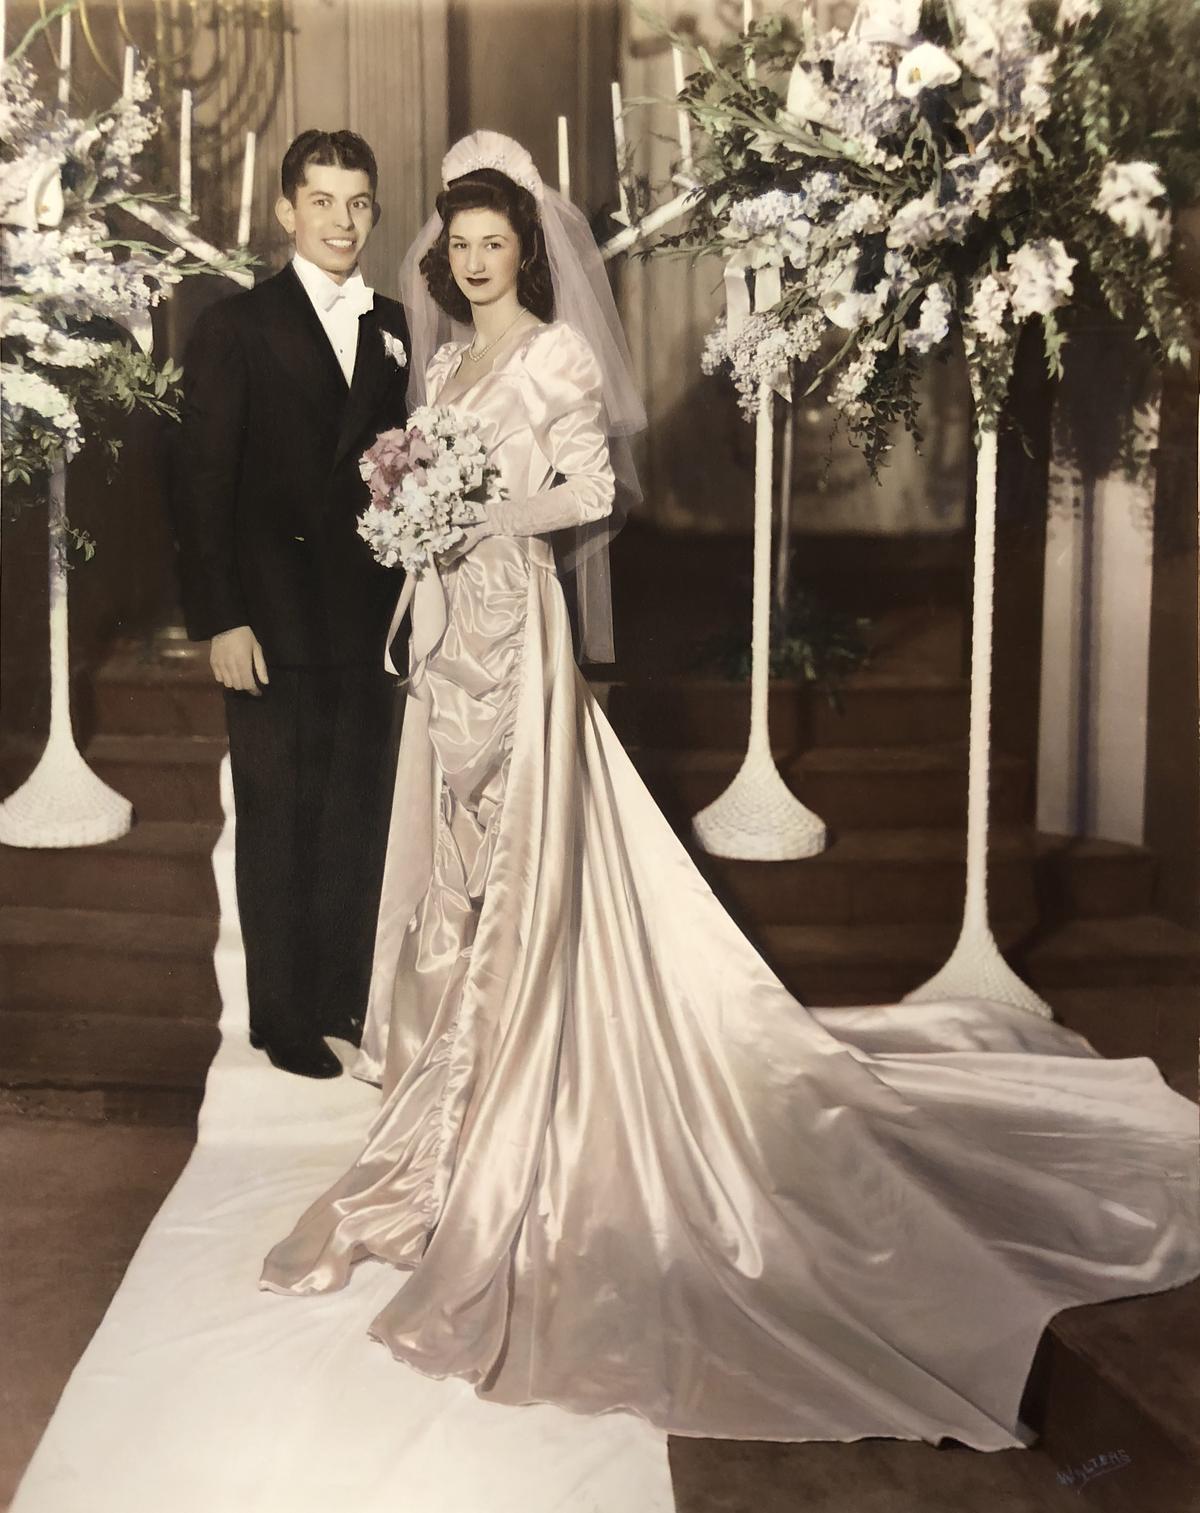 Becky and Jack Benaroya on their wedding day.